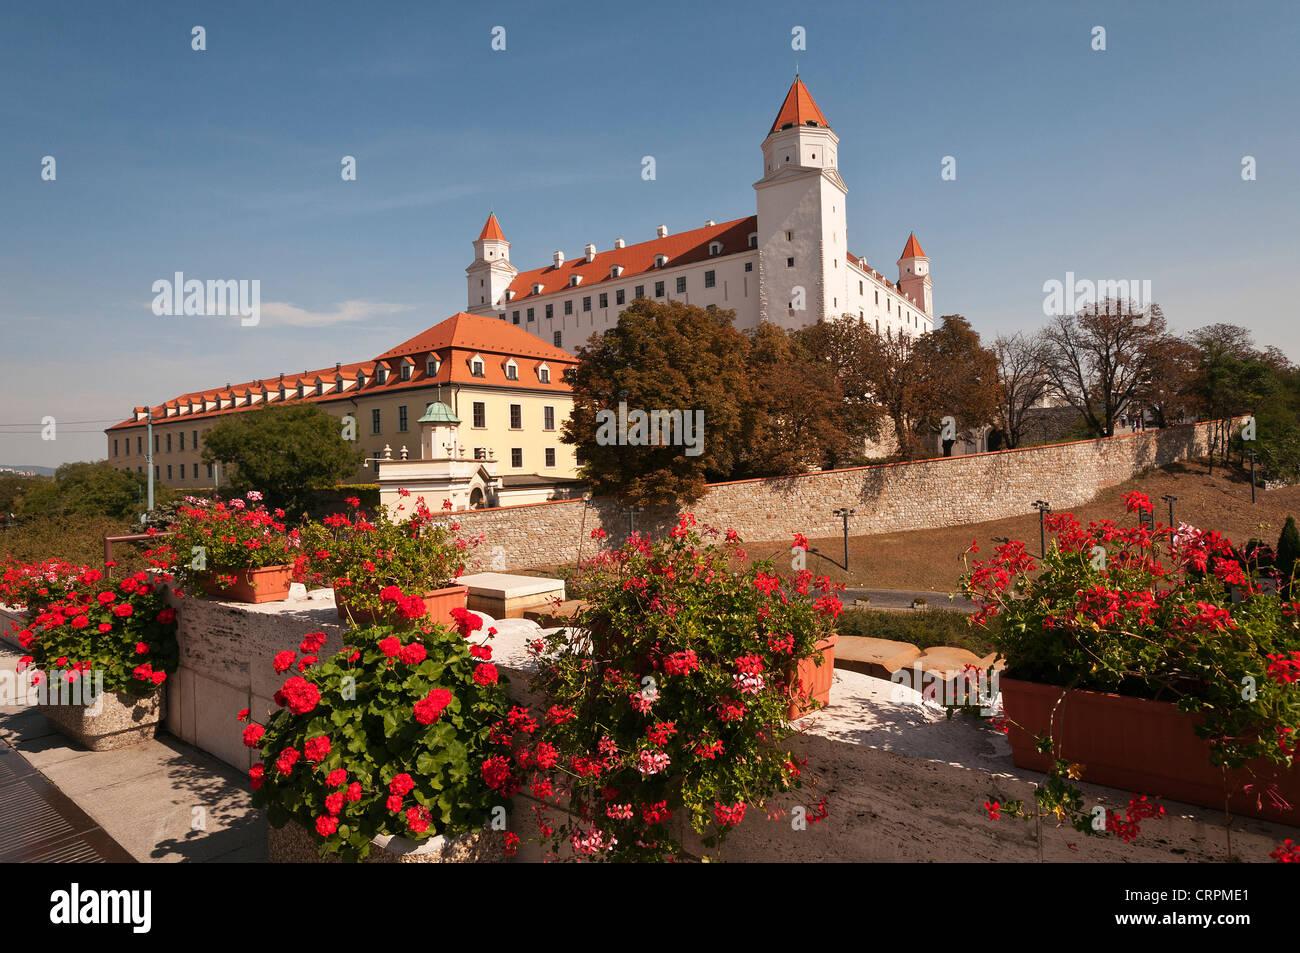 Elk189-1161 Slovakia, Bratislava, Bratislava Castle - Stock Image